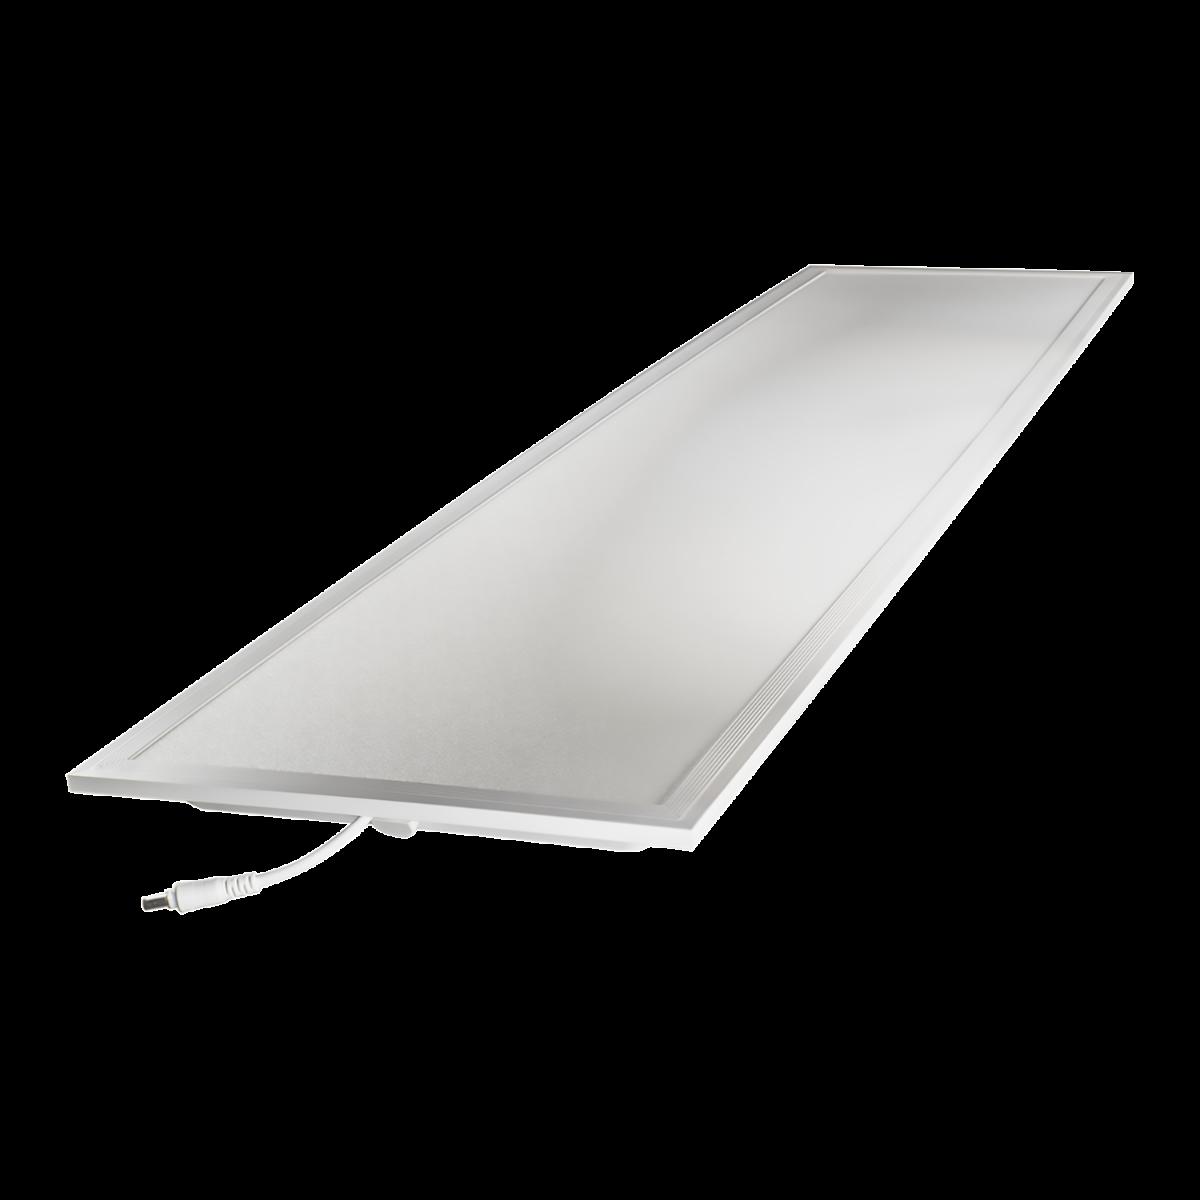 Noxion LED Panel Delta Pro Highlum V2.0 40W 30x120cm 3000K 5280lm UGR <19 | Warmweiß - Ersatz für 2x36W